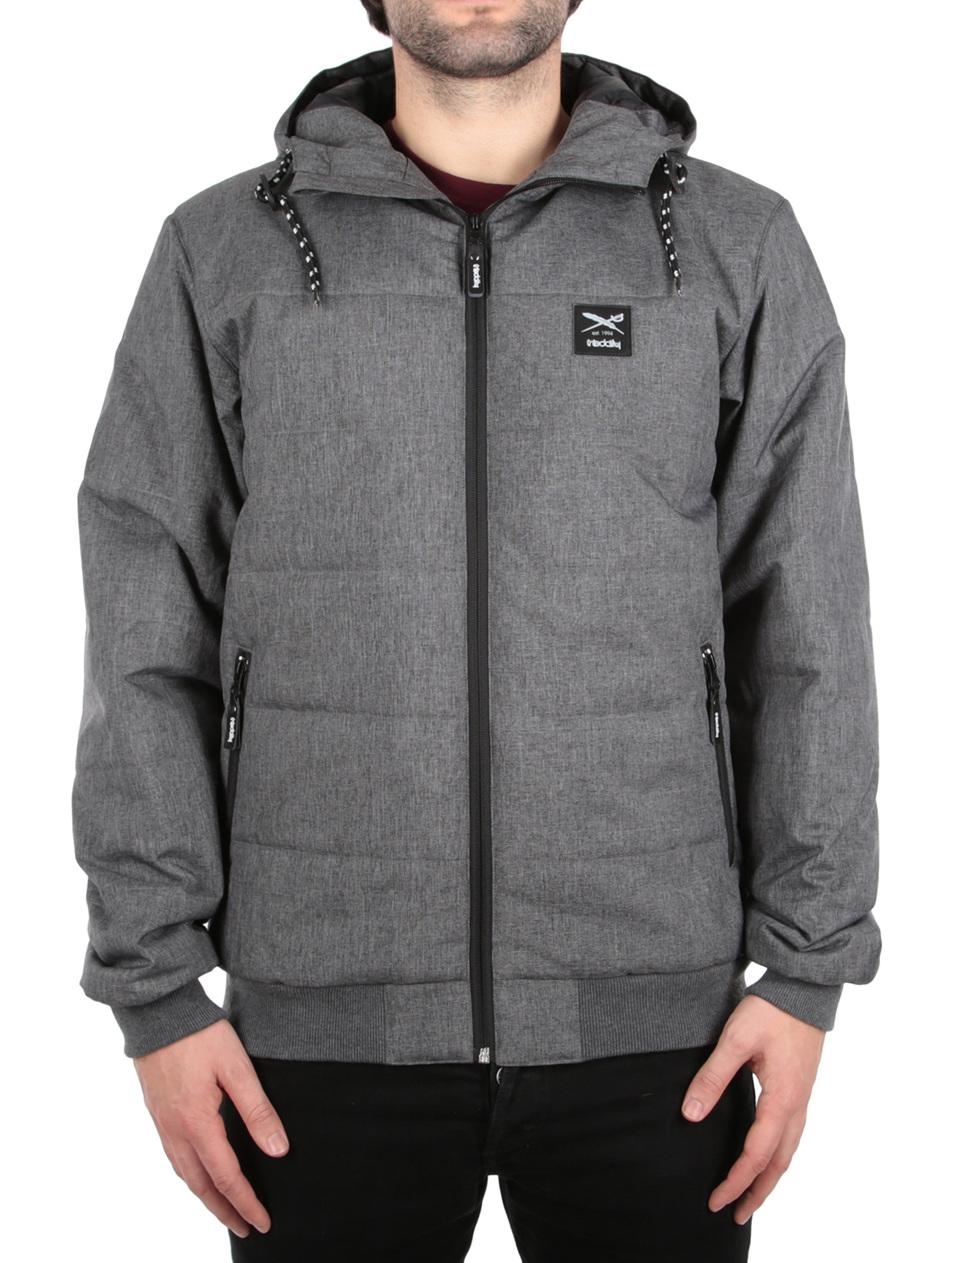 Streetwear Fr Mnner Im Offiziellen Onlineshop Iriedaily Tendencies Sweater Hoody Green Zipper Olive S City Arctic Mel Jacket Anthra